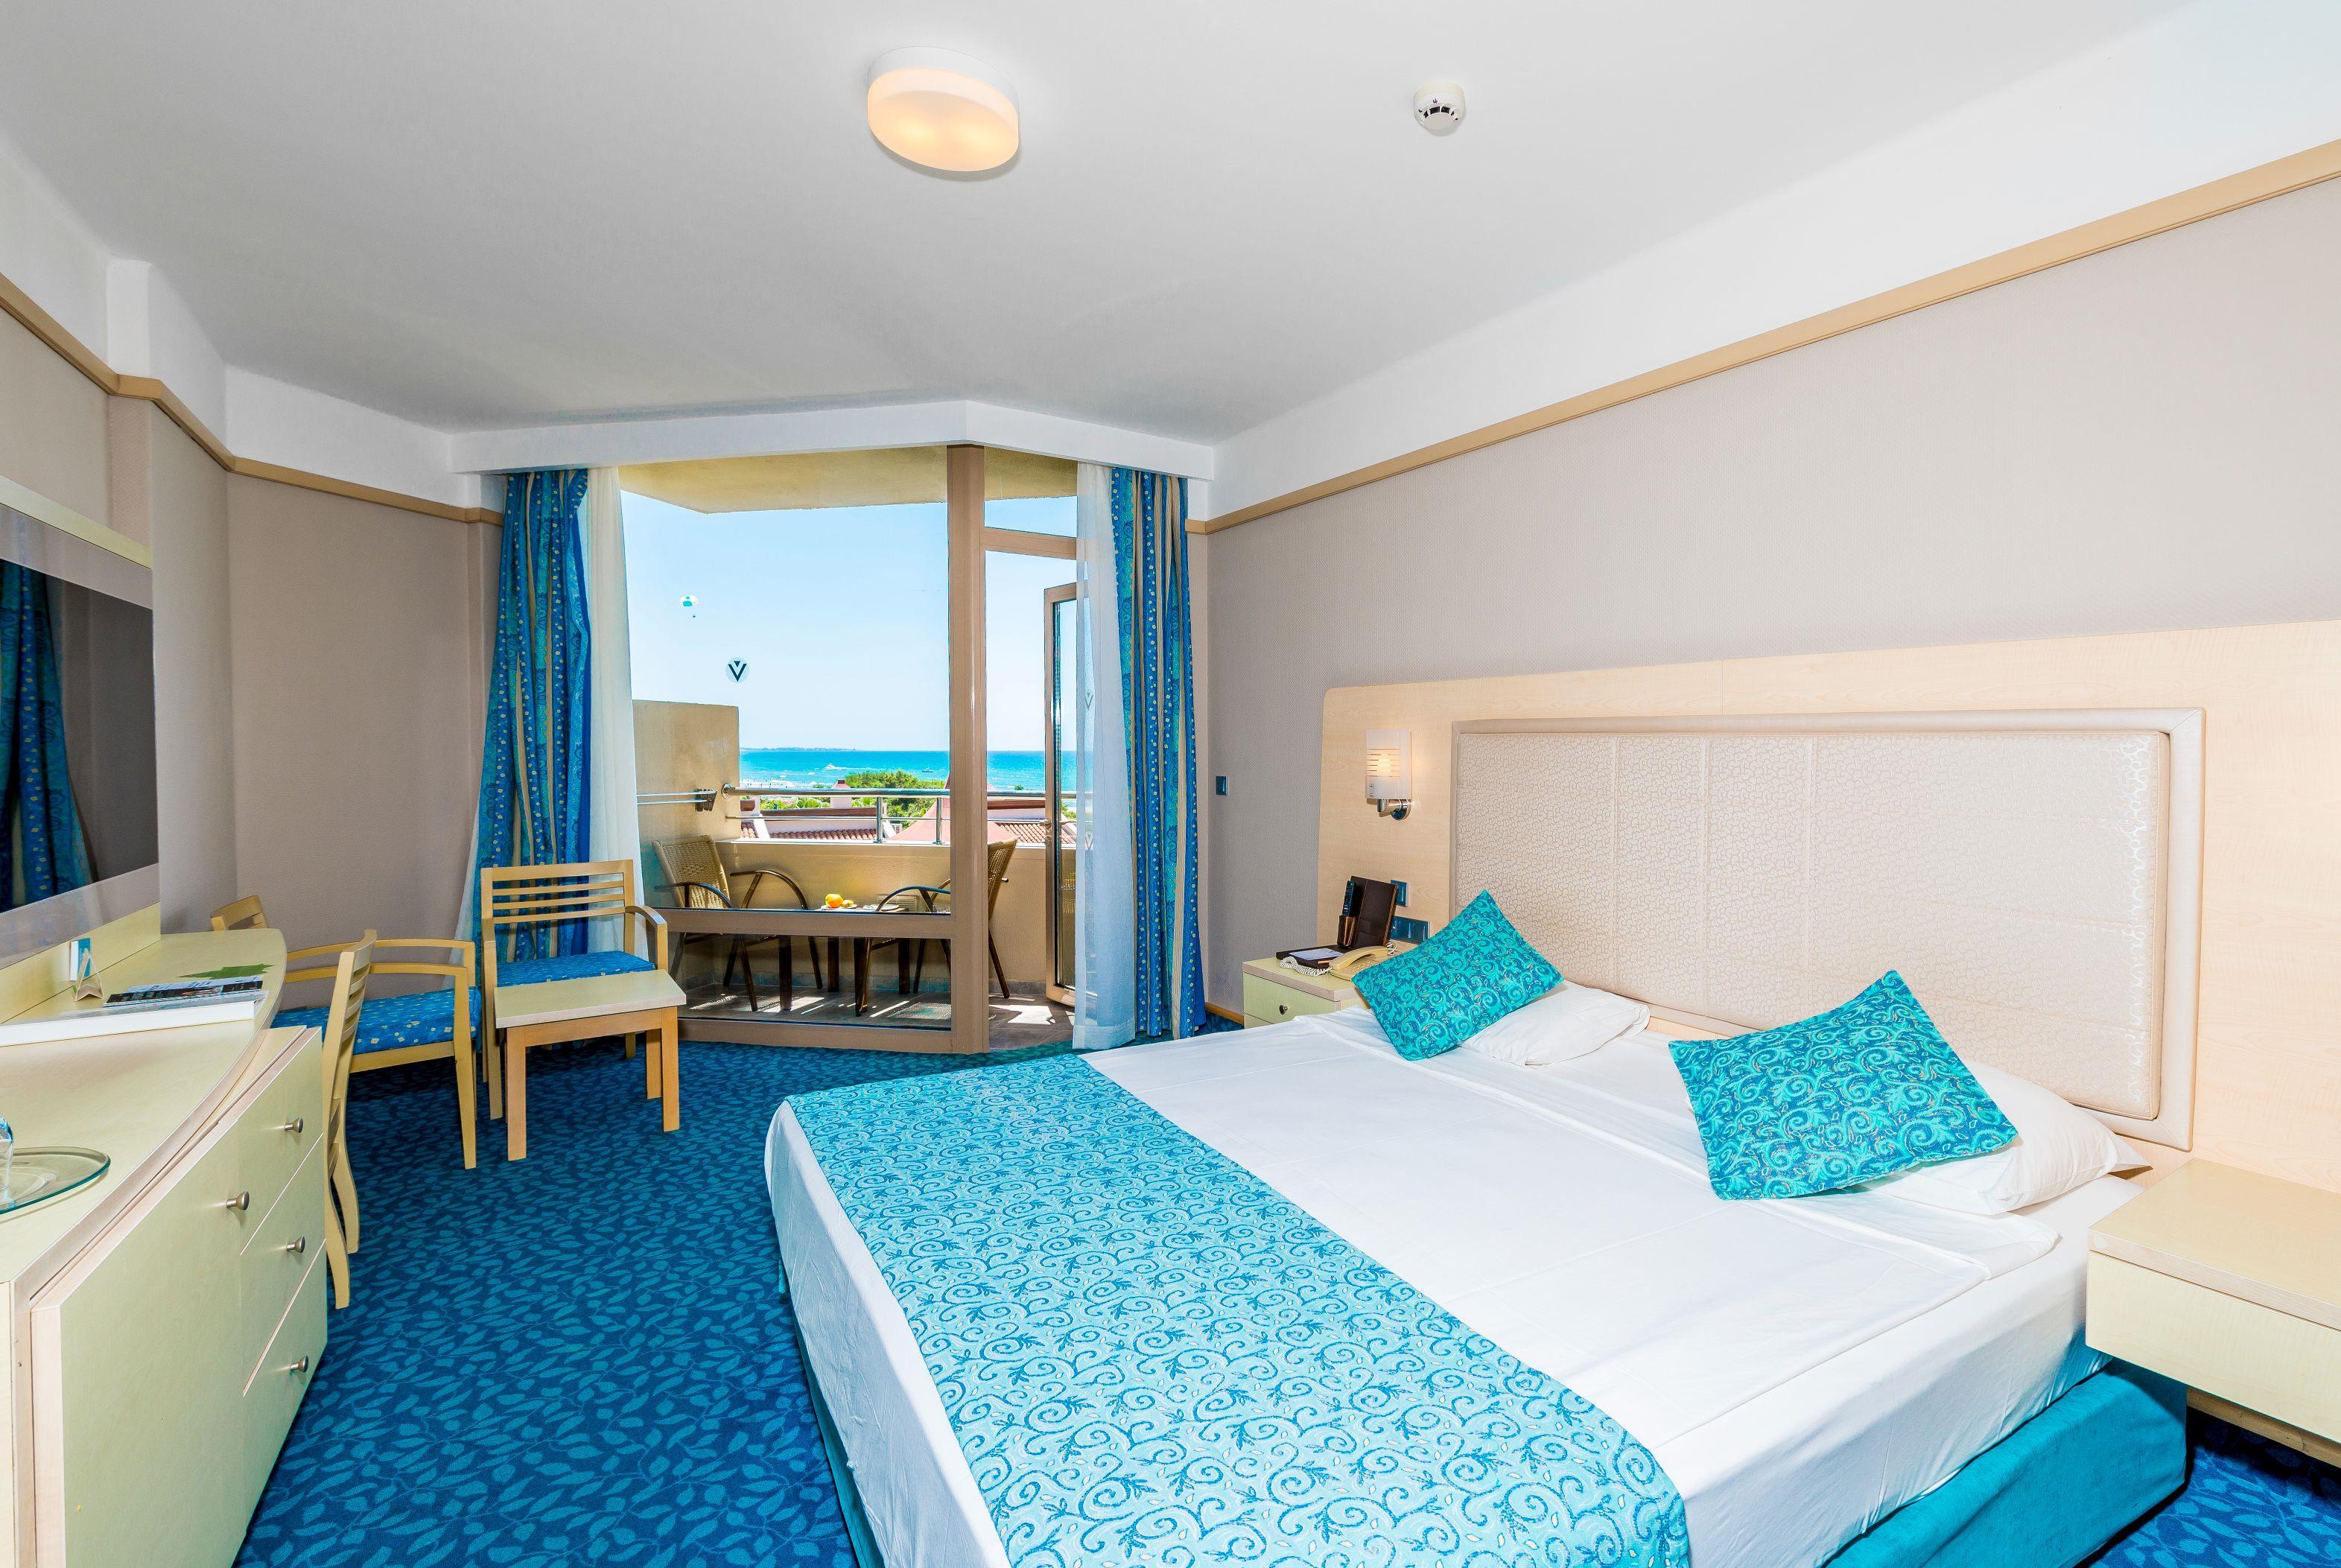 http://www.orextravel.sk/OREX/hotelphotos/vonresort-golden-coast-general-0052.jpg